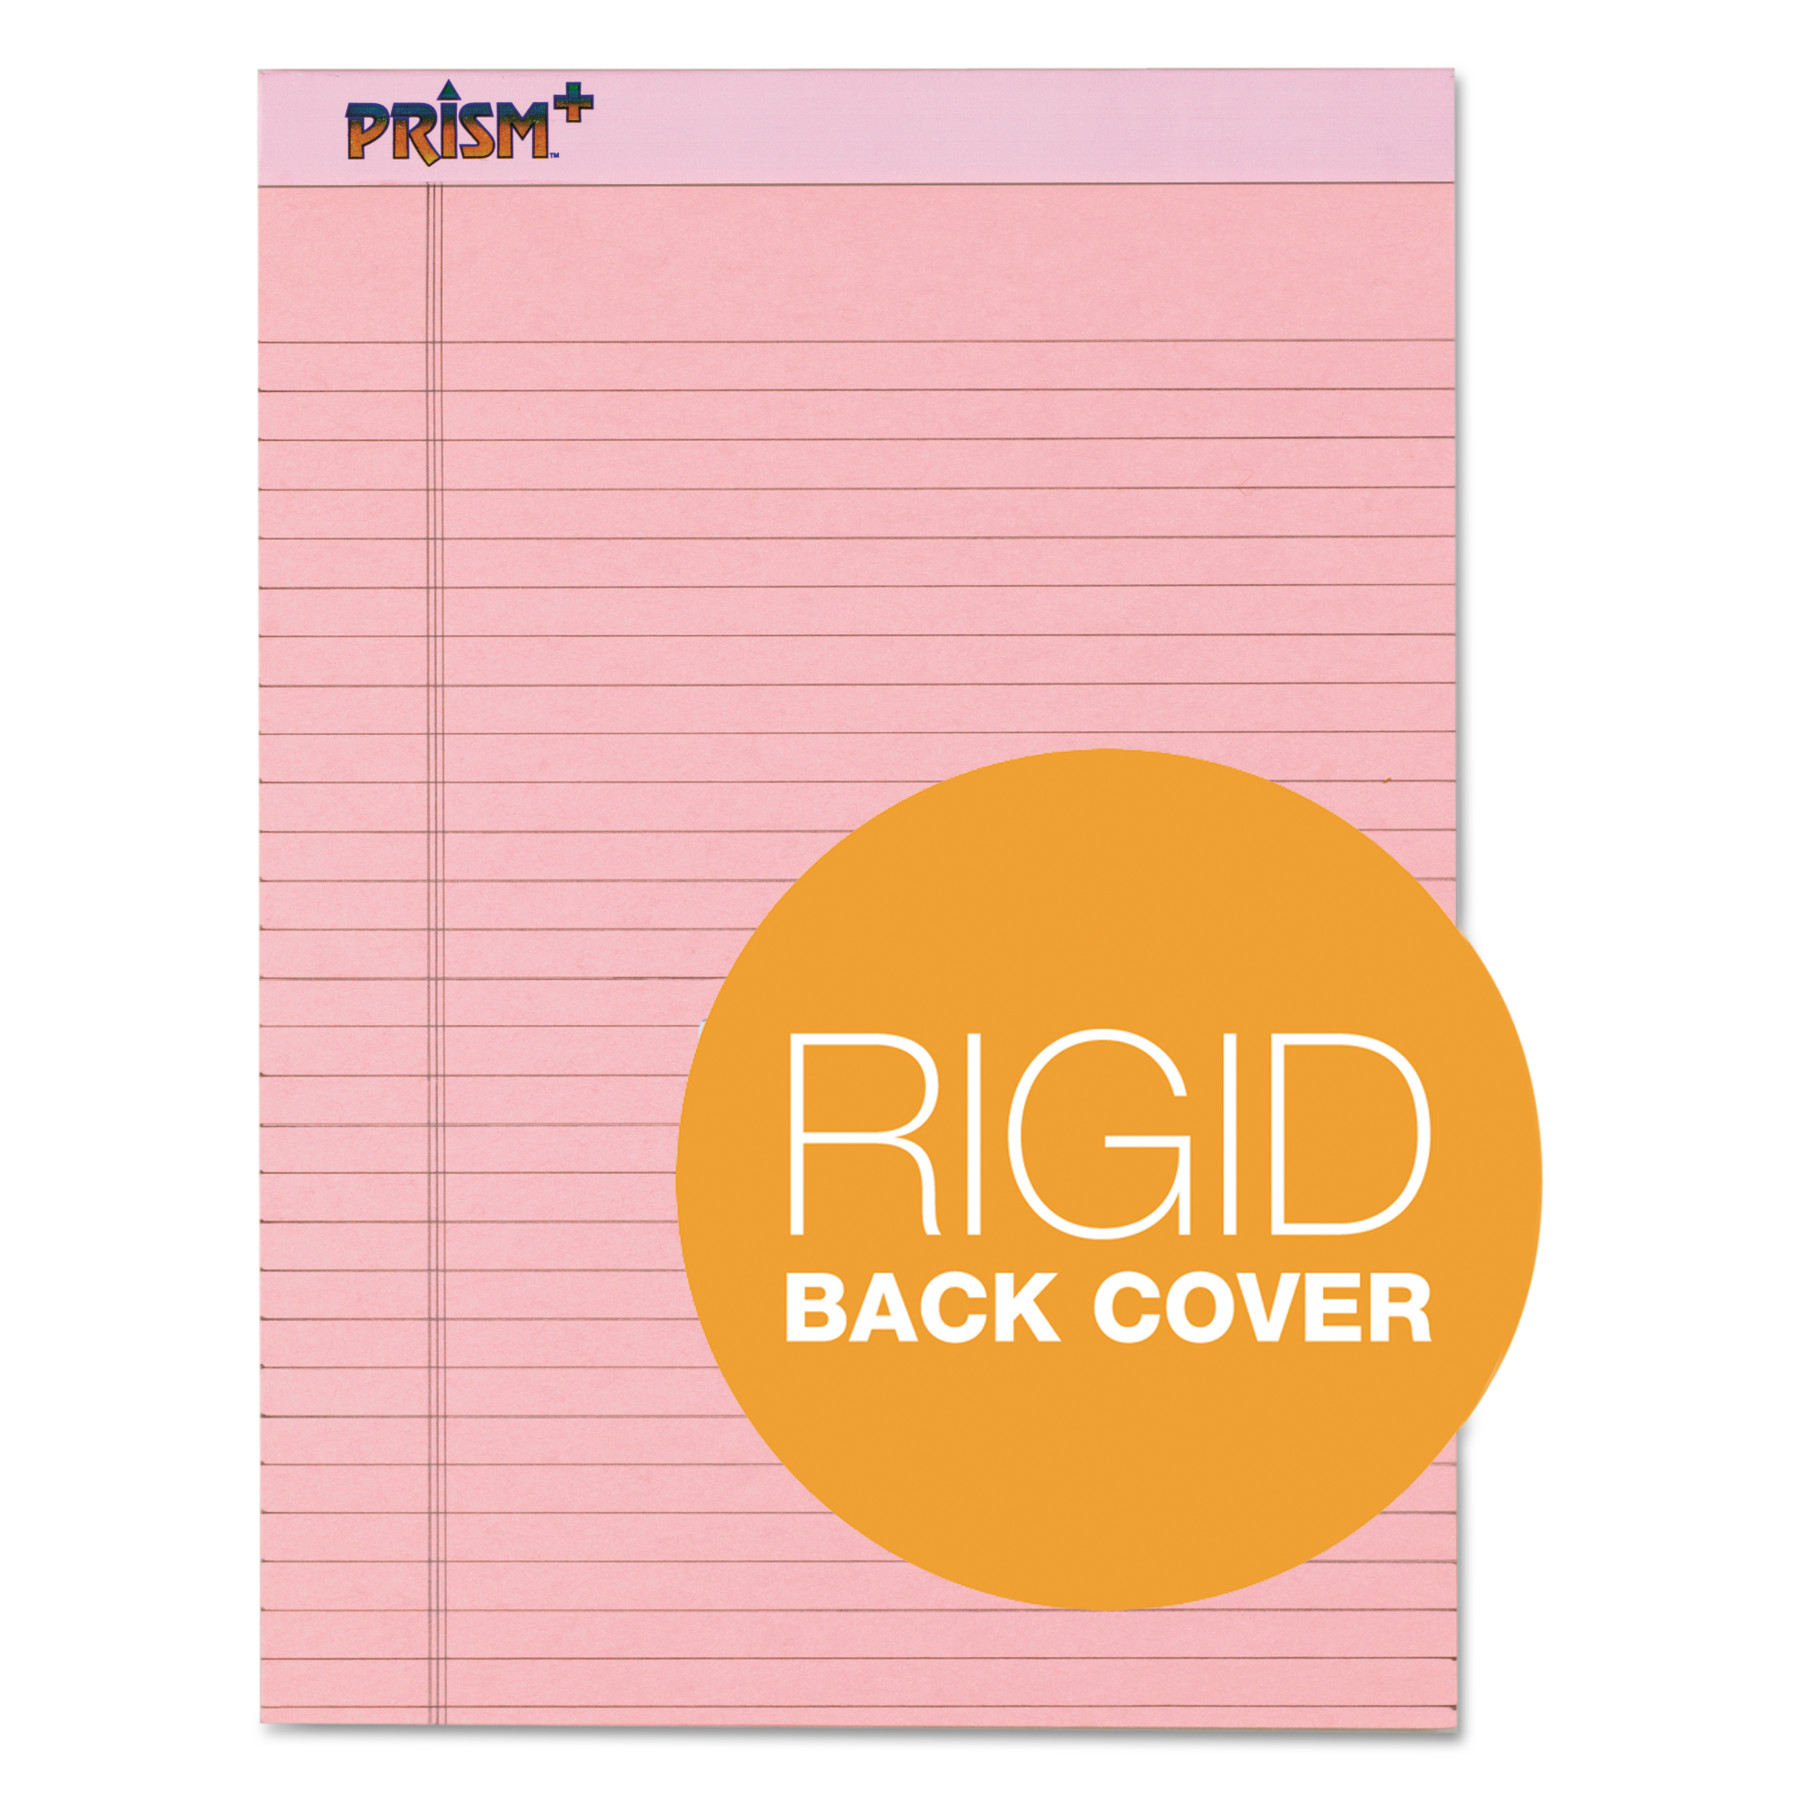 TOPS Prism Plus Colored Legal Pads, 8 1/2 x 11 3/4, Blue, 50 Sheets ...